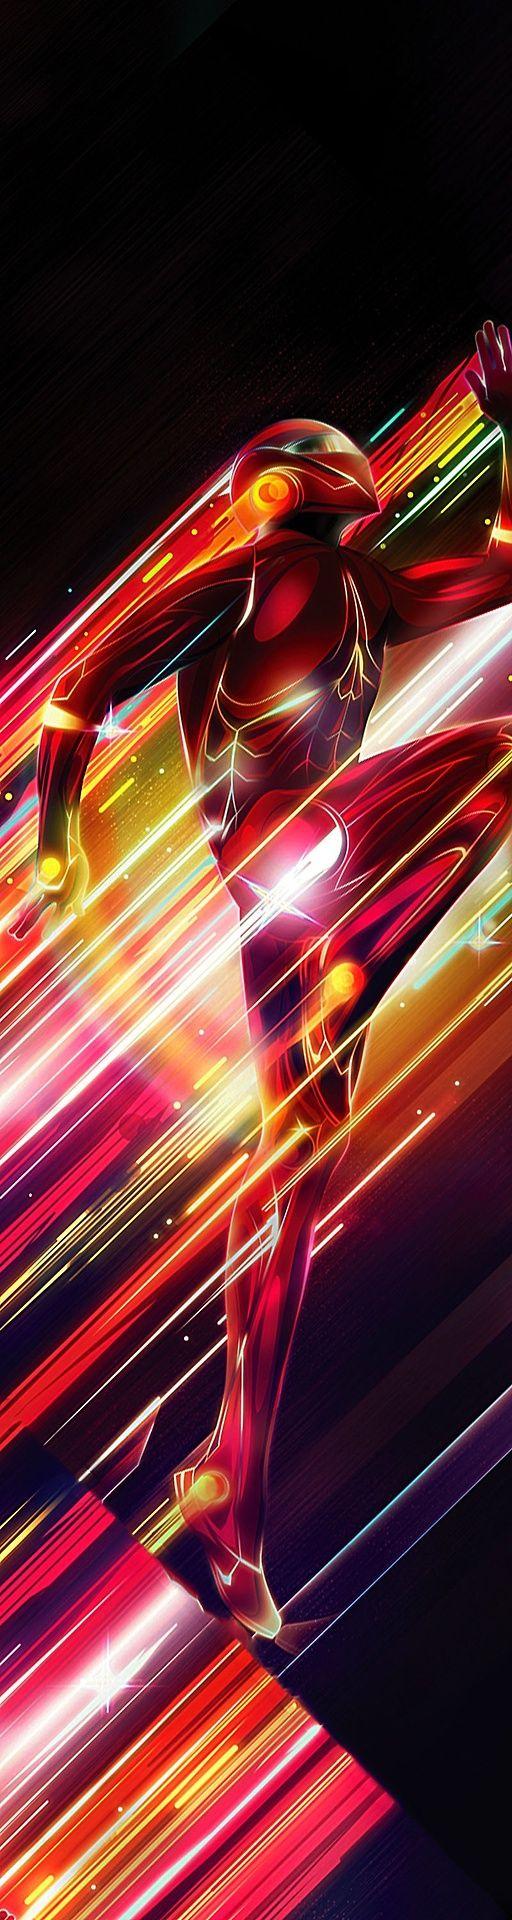 best milan top trents images on pinterest backgrounds design